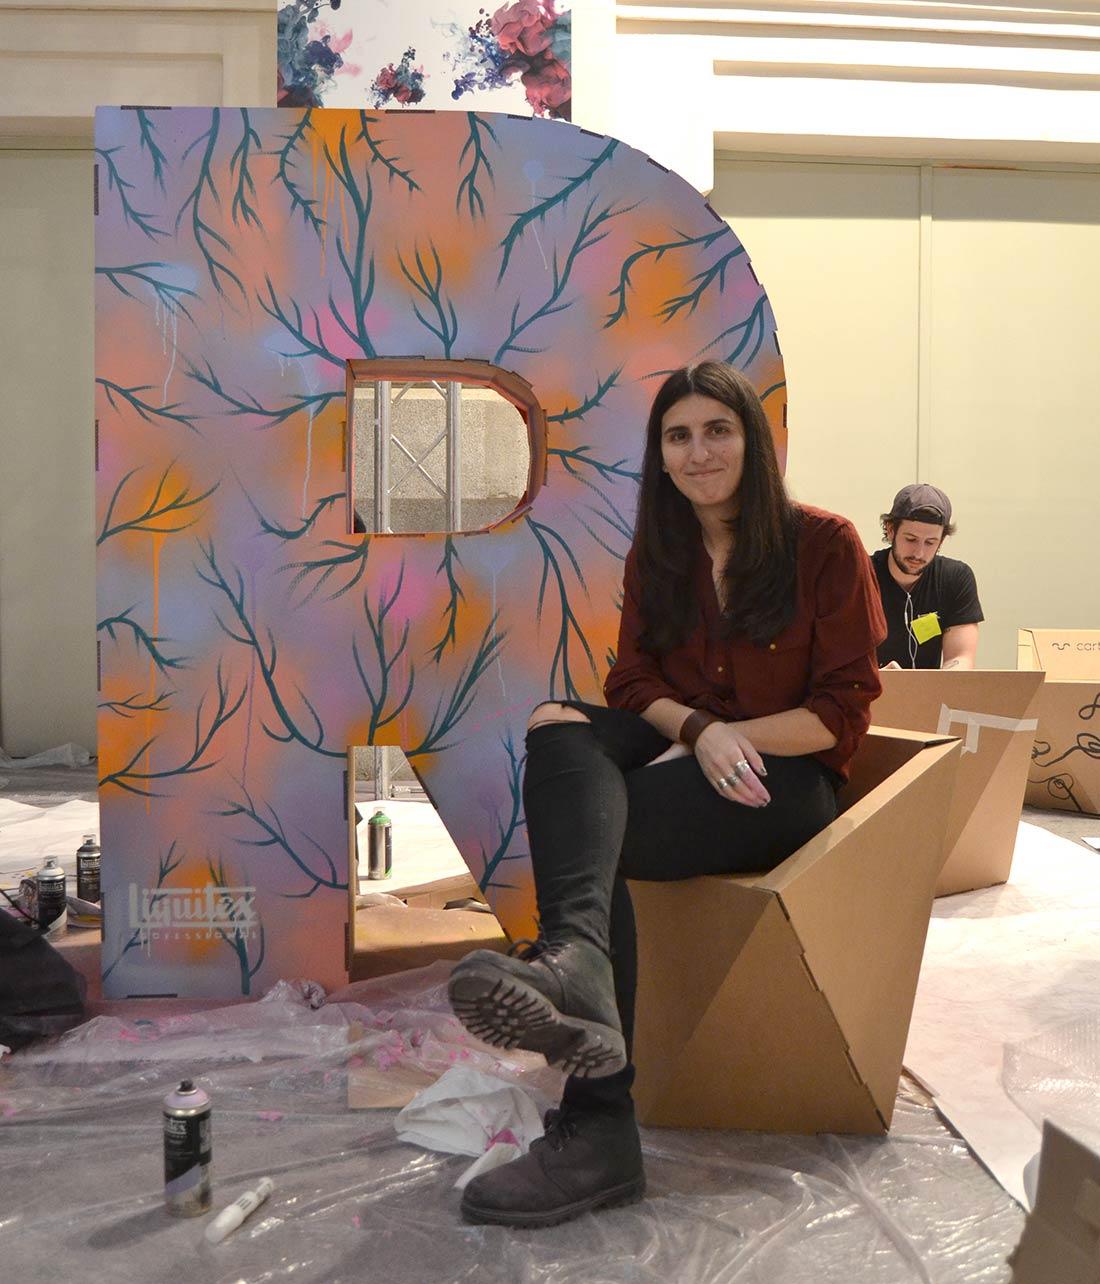 art madrid feria arte letras mobiliario carton corporeos gigantes ied madrid 10